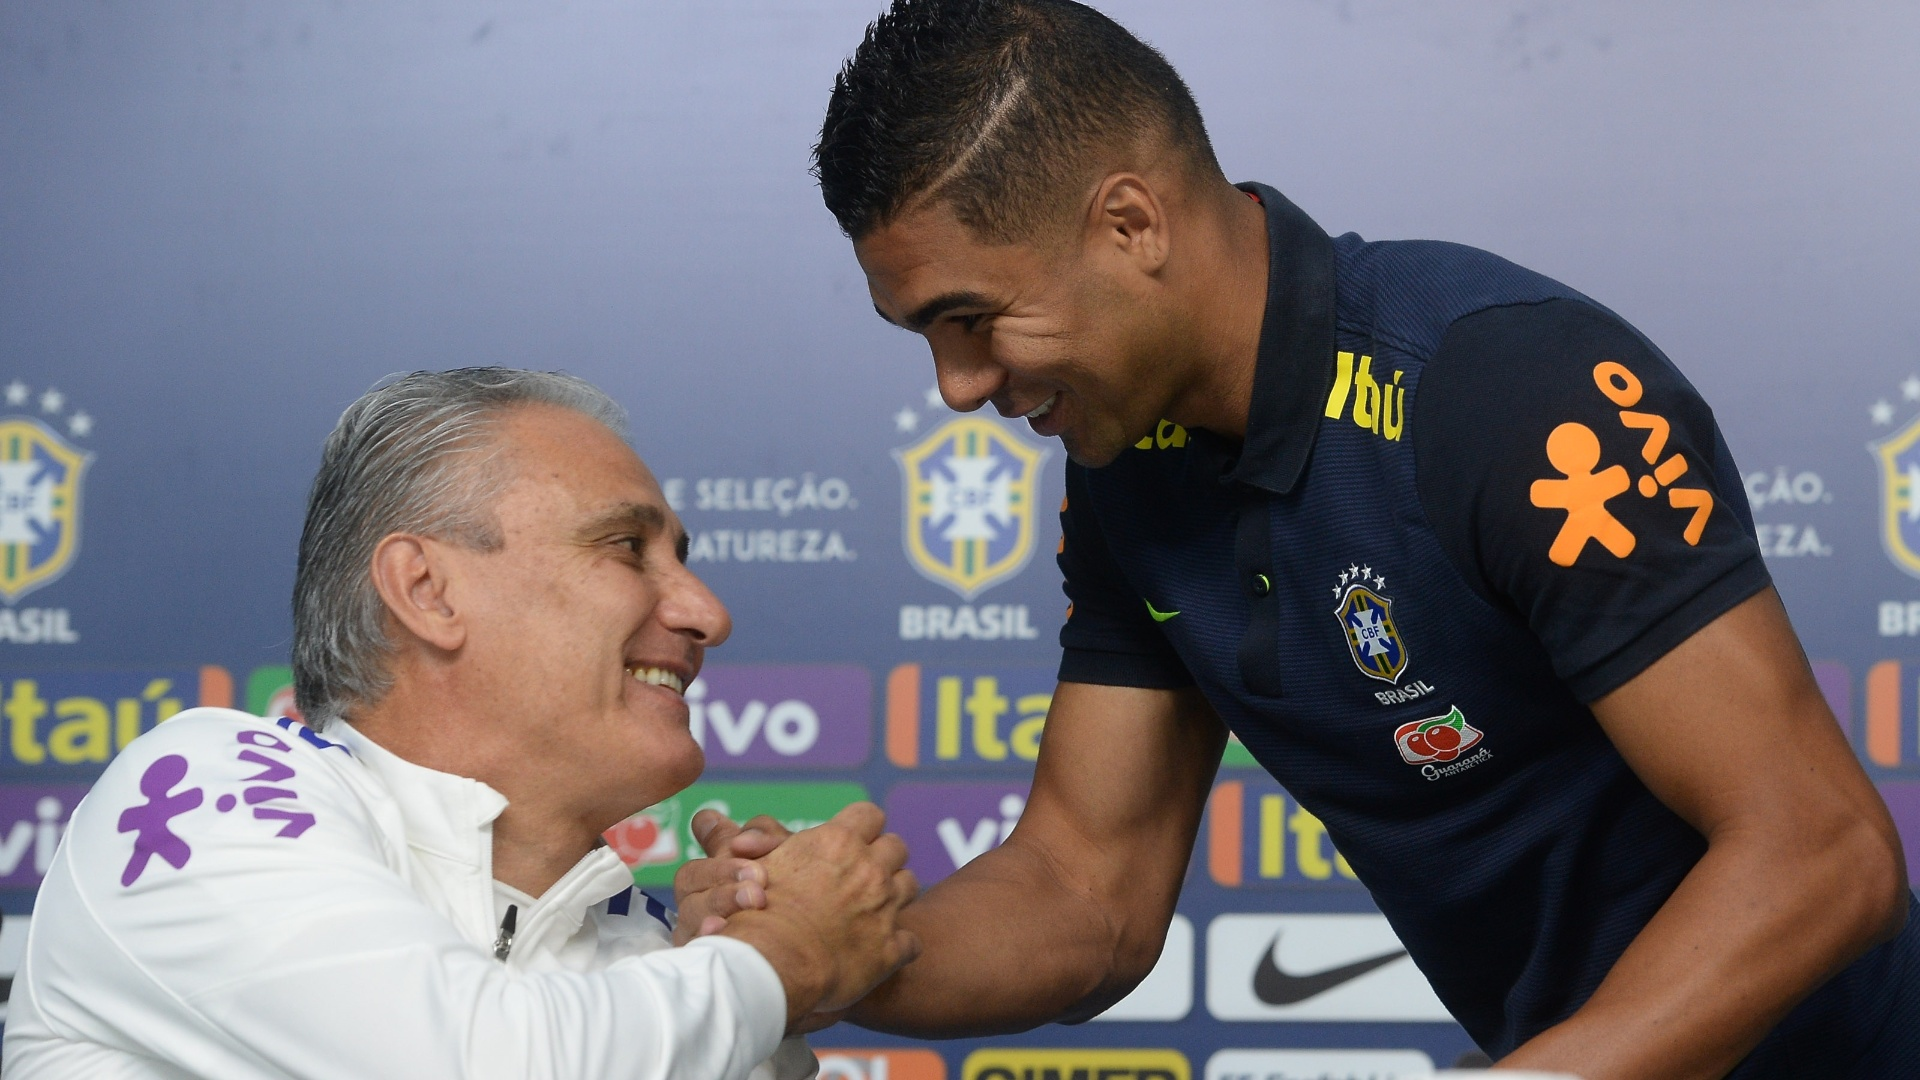 Tite cumprimenta Casemiro durante coletiva da seleção brasileria